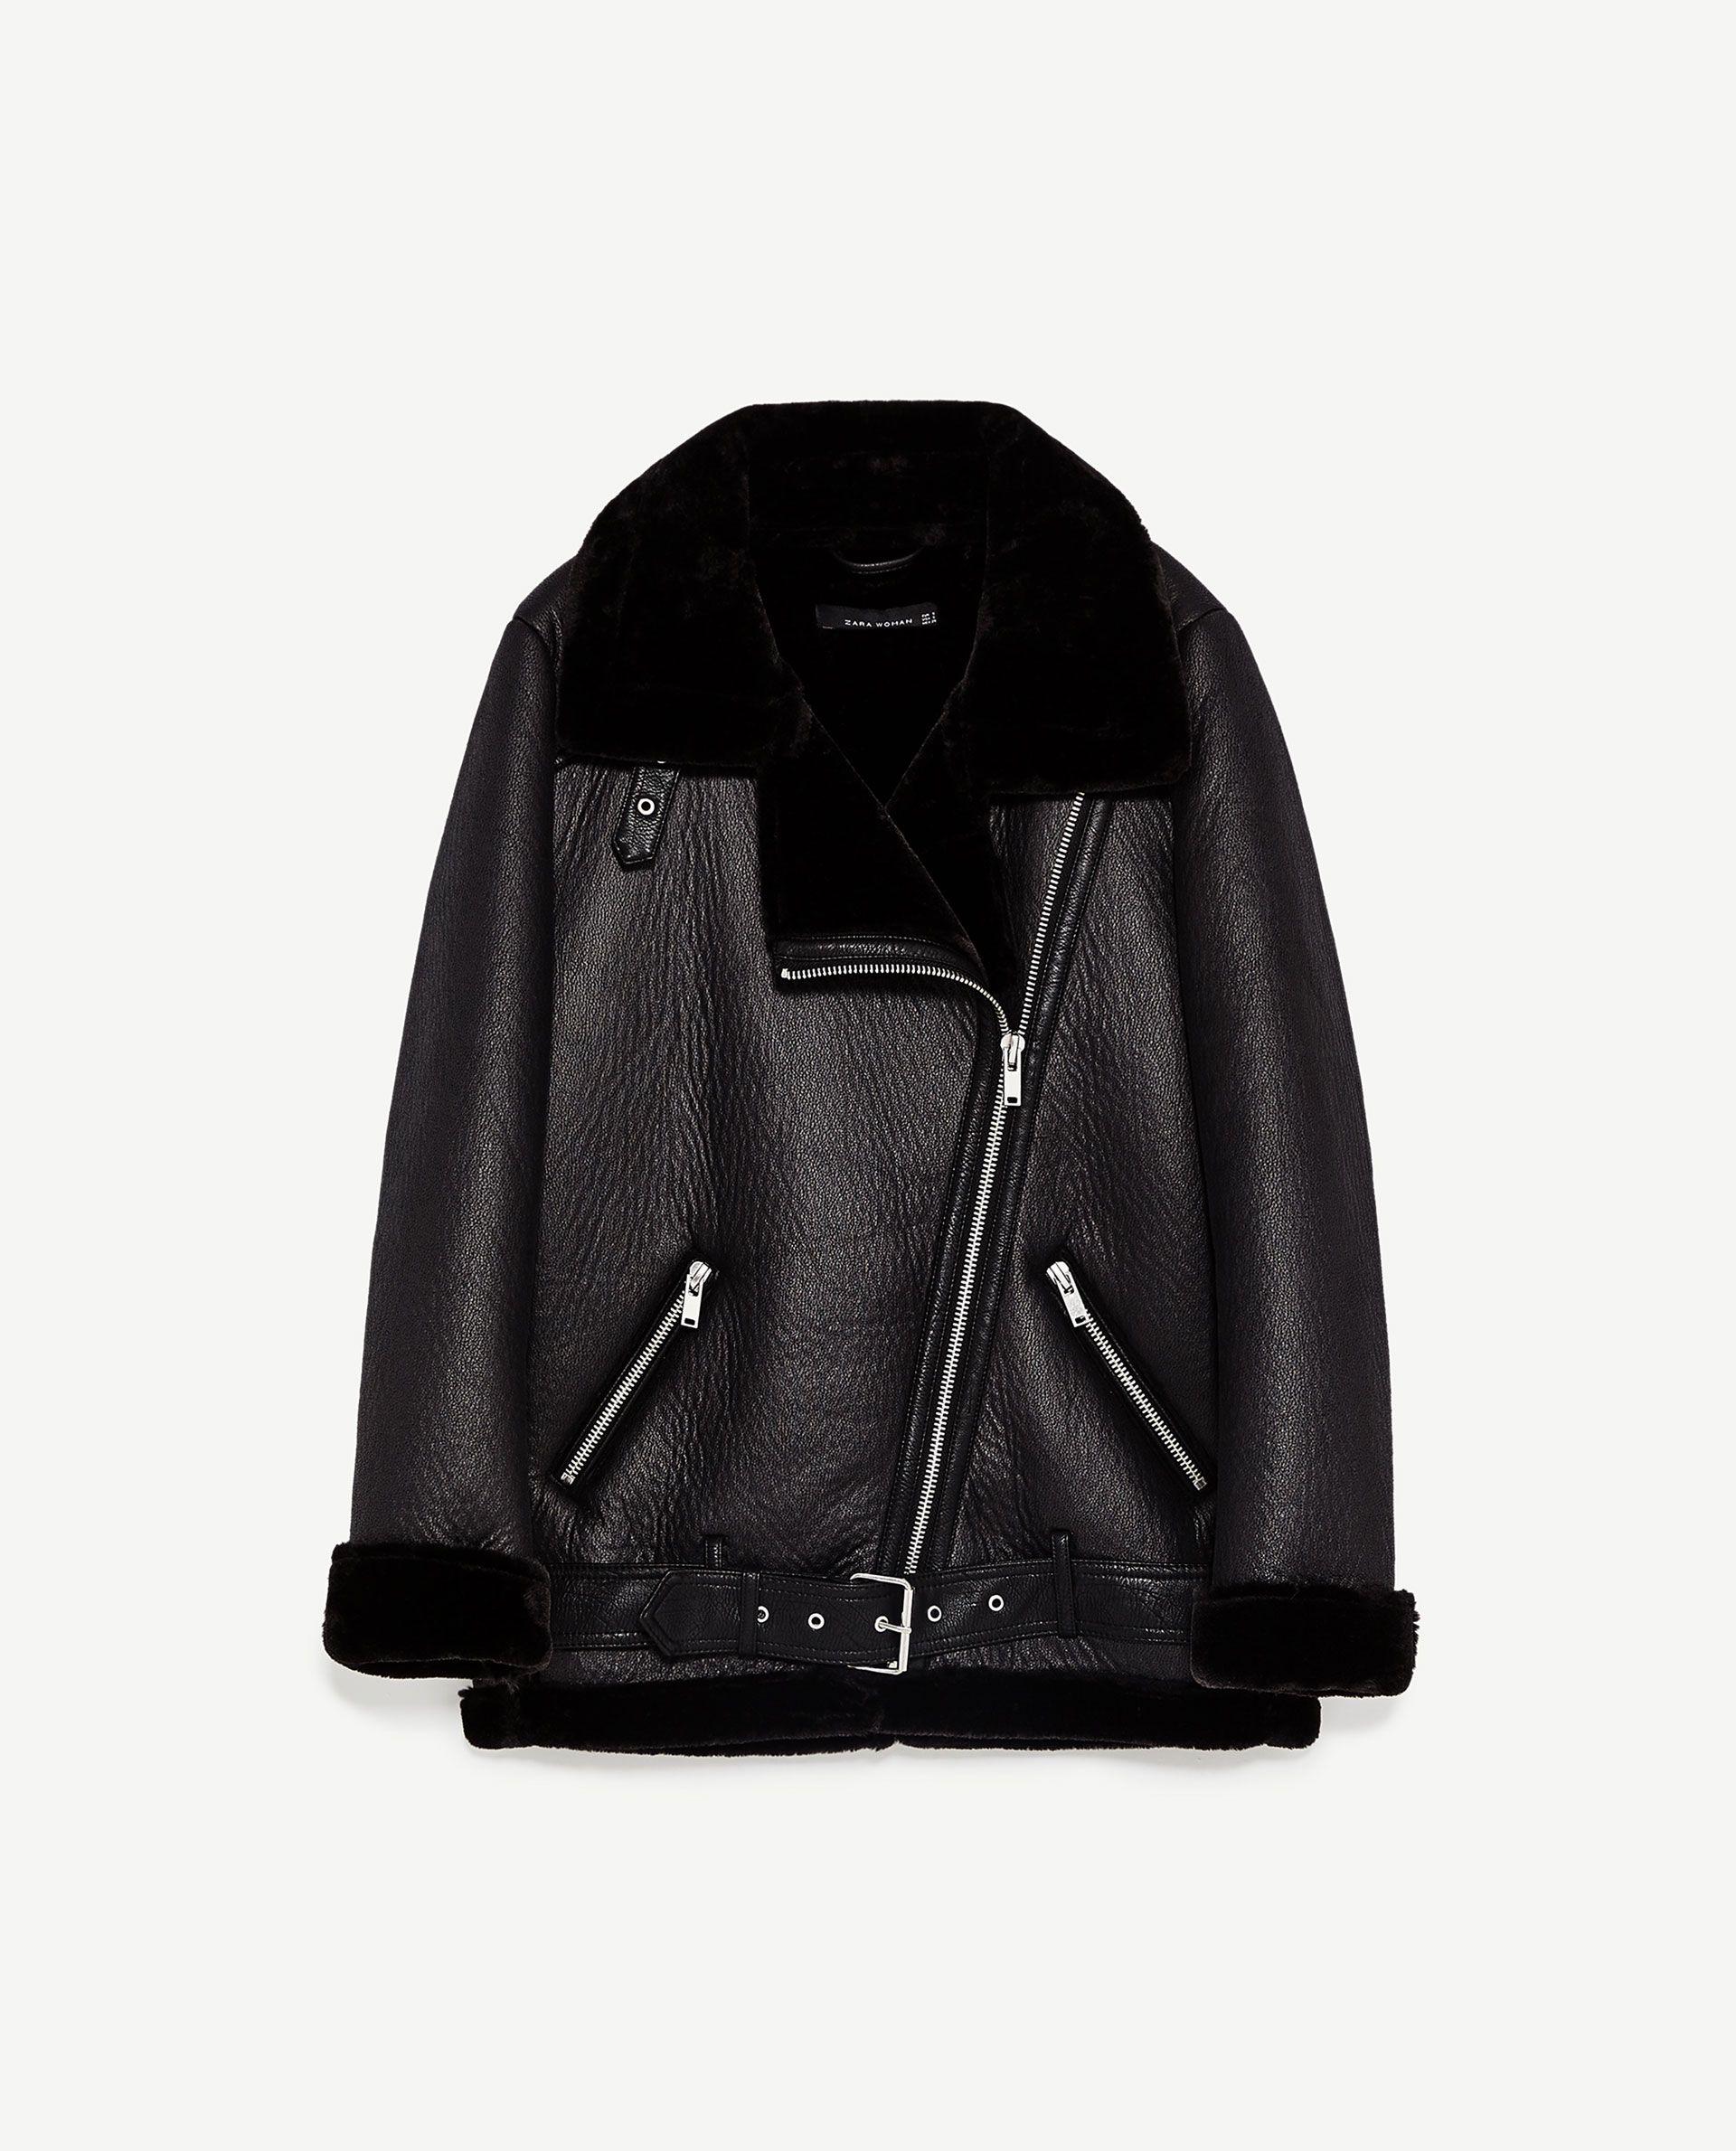 US/&R Women Solid Color Zip Up Turndown Collar Faux Suede Short Moto Jacket